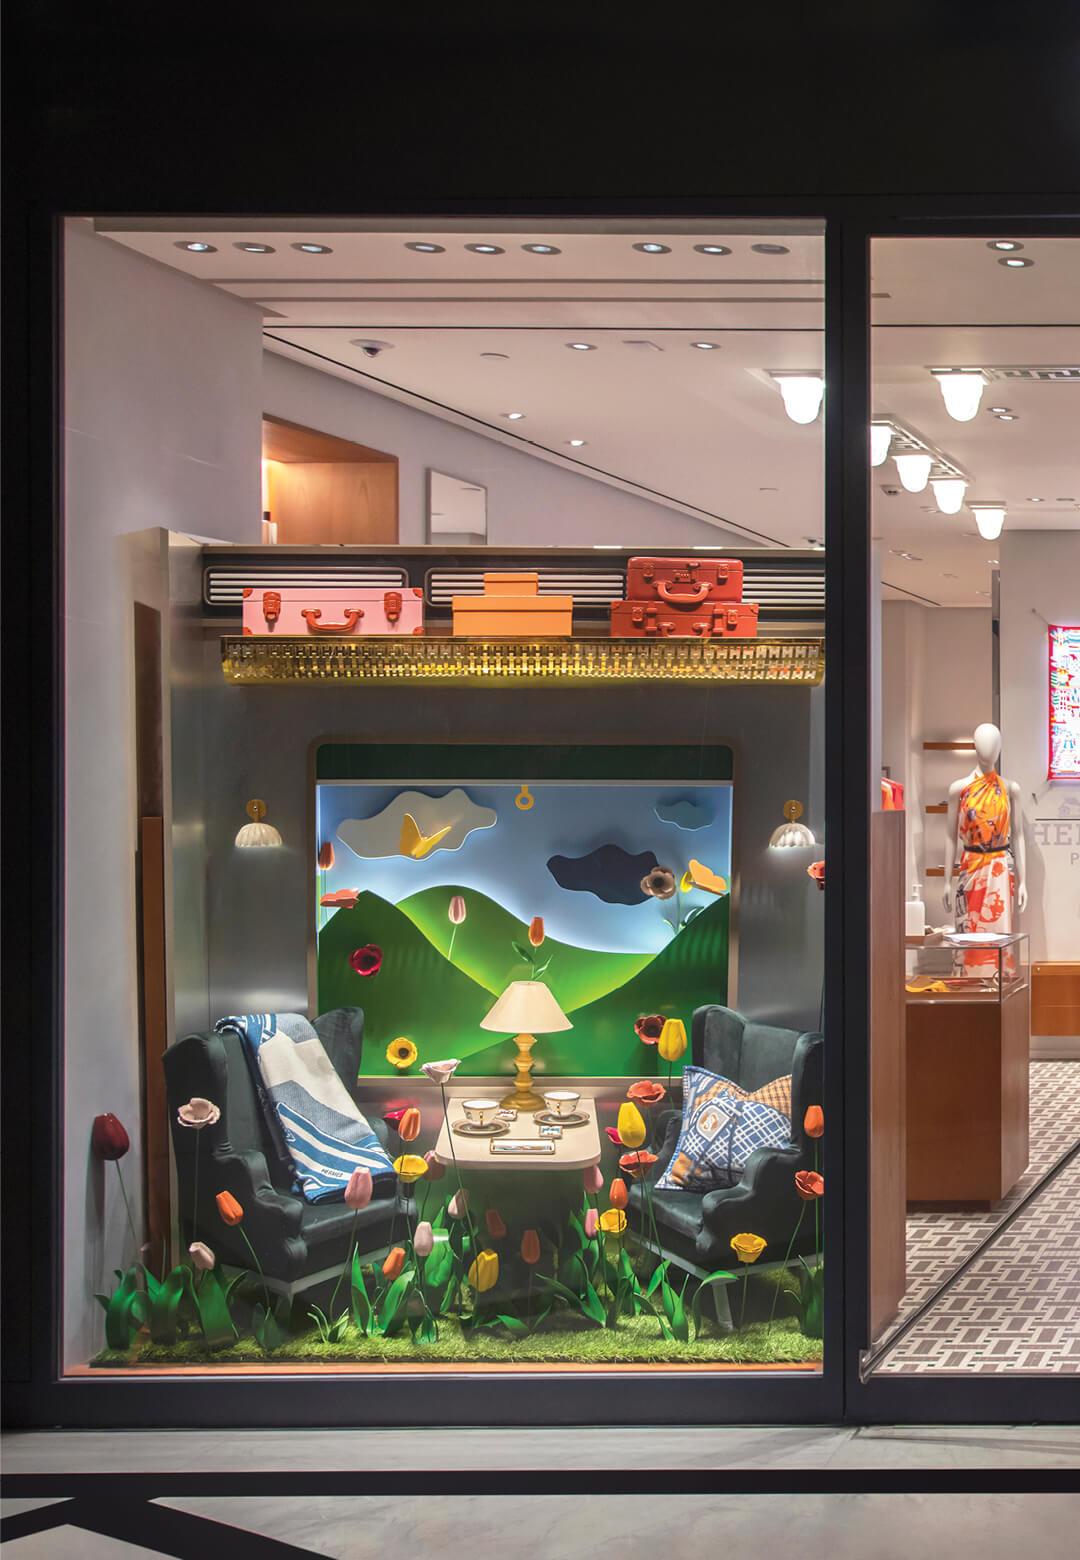 Hermès store in Delhi with festive window display (2020) | Hermès Festive Windows in India (2020) | STIRworld